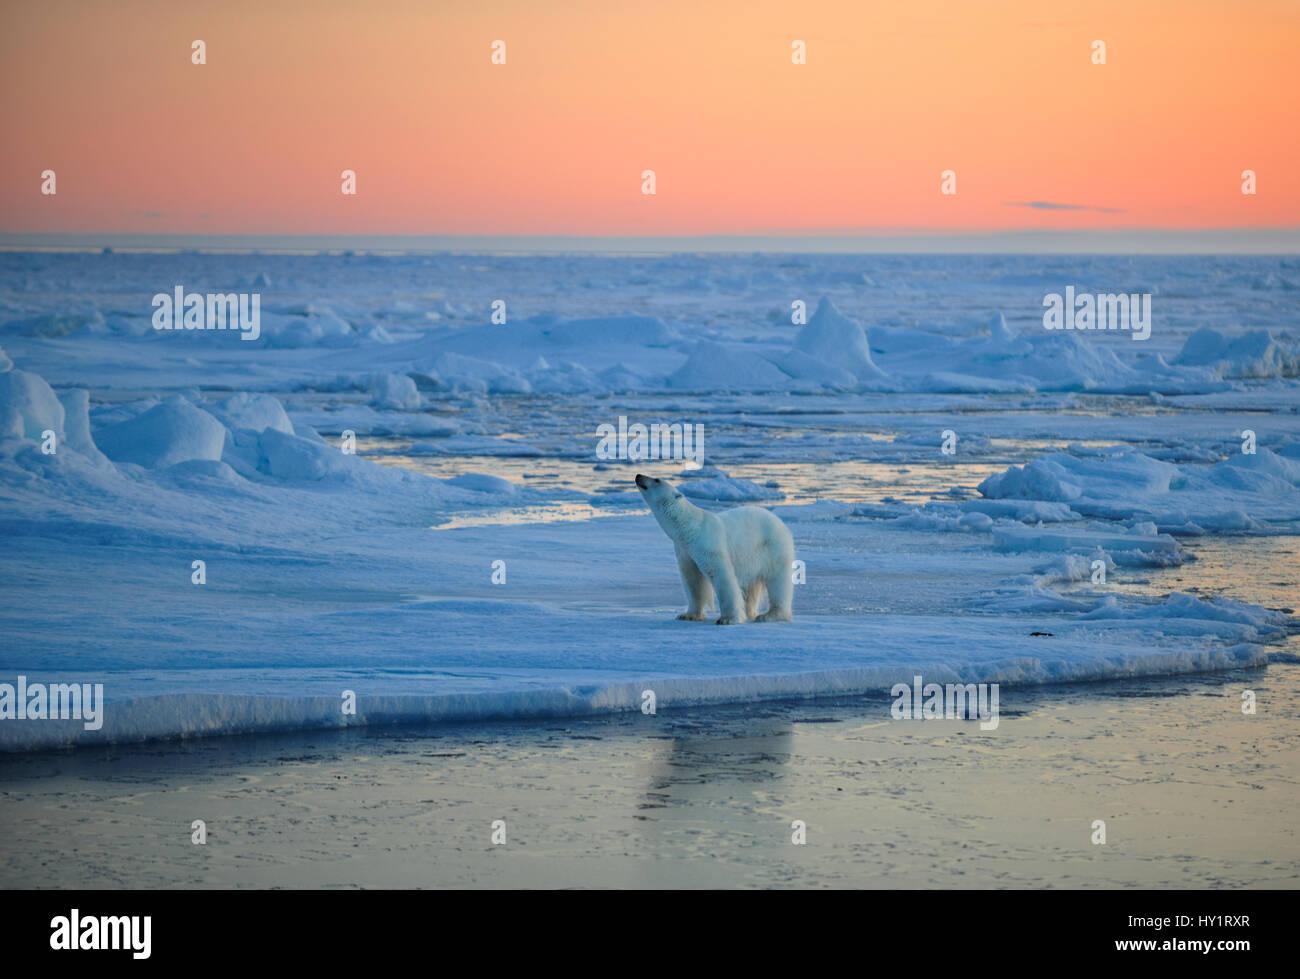 RF- Polar Bear (Ursus maritimus) on pack ice, sniffing the air at sunset, Svalbard, Norway, September 2009. Endangered - Stock Image